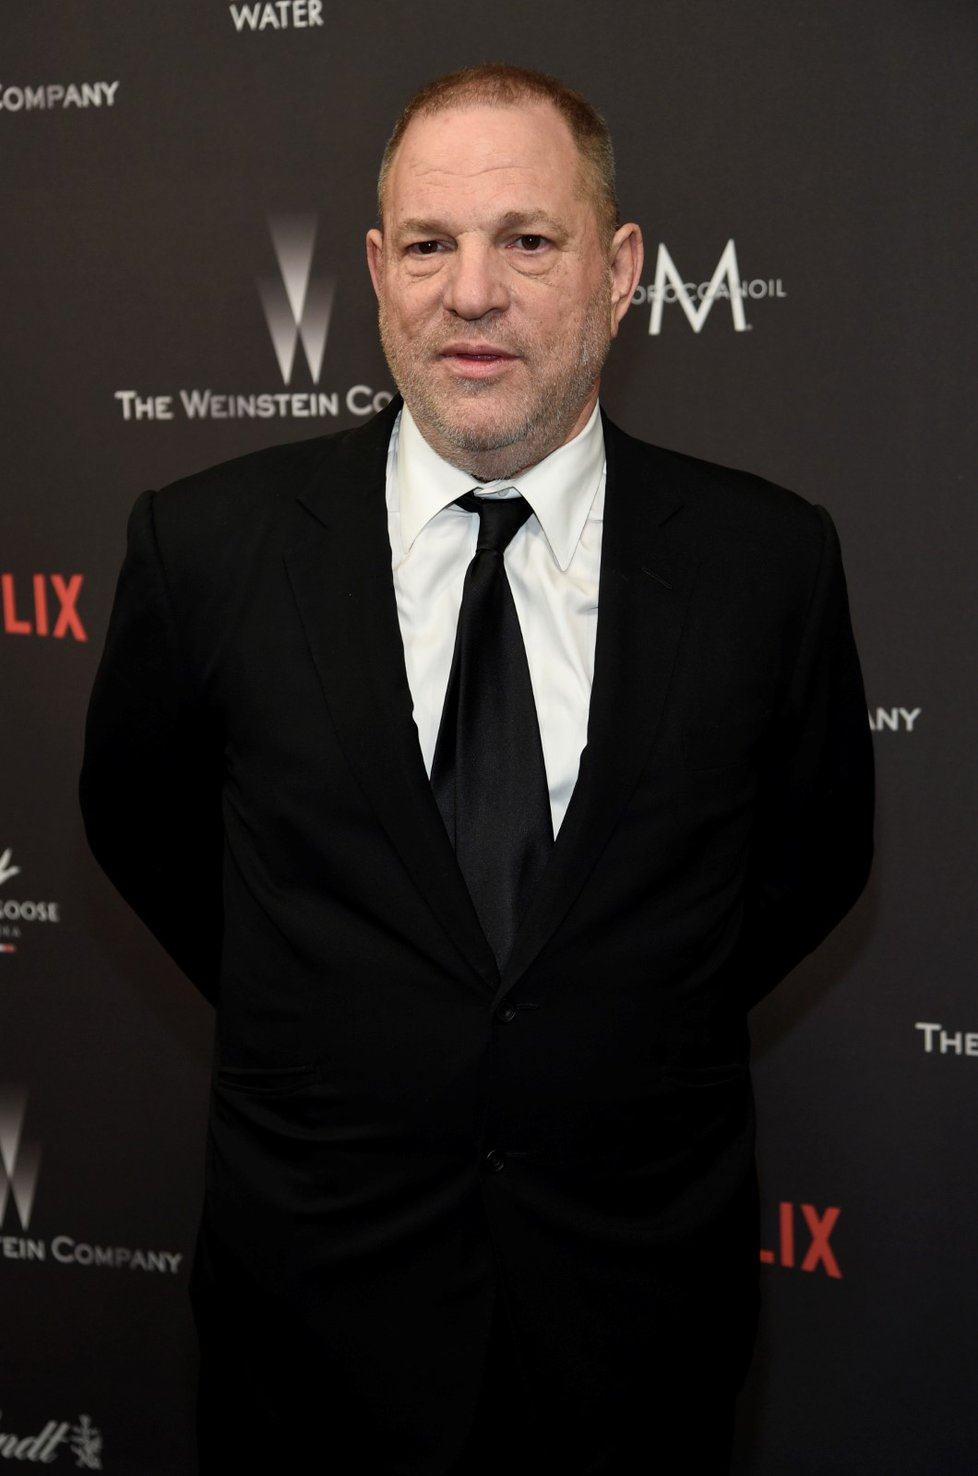 Harvey Weinstein, hollywoodský producent